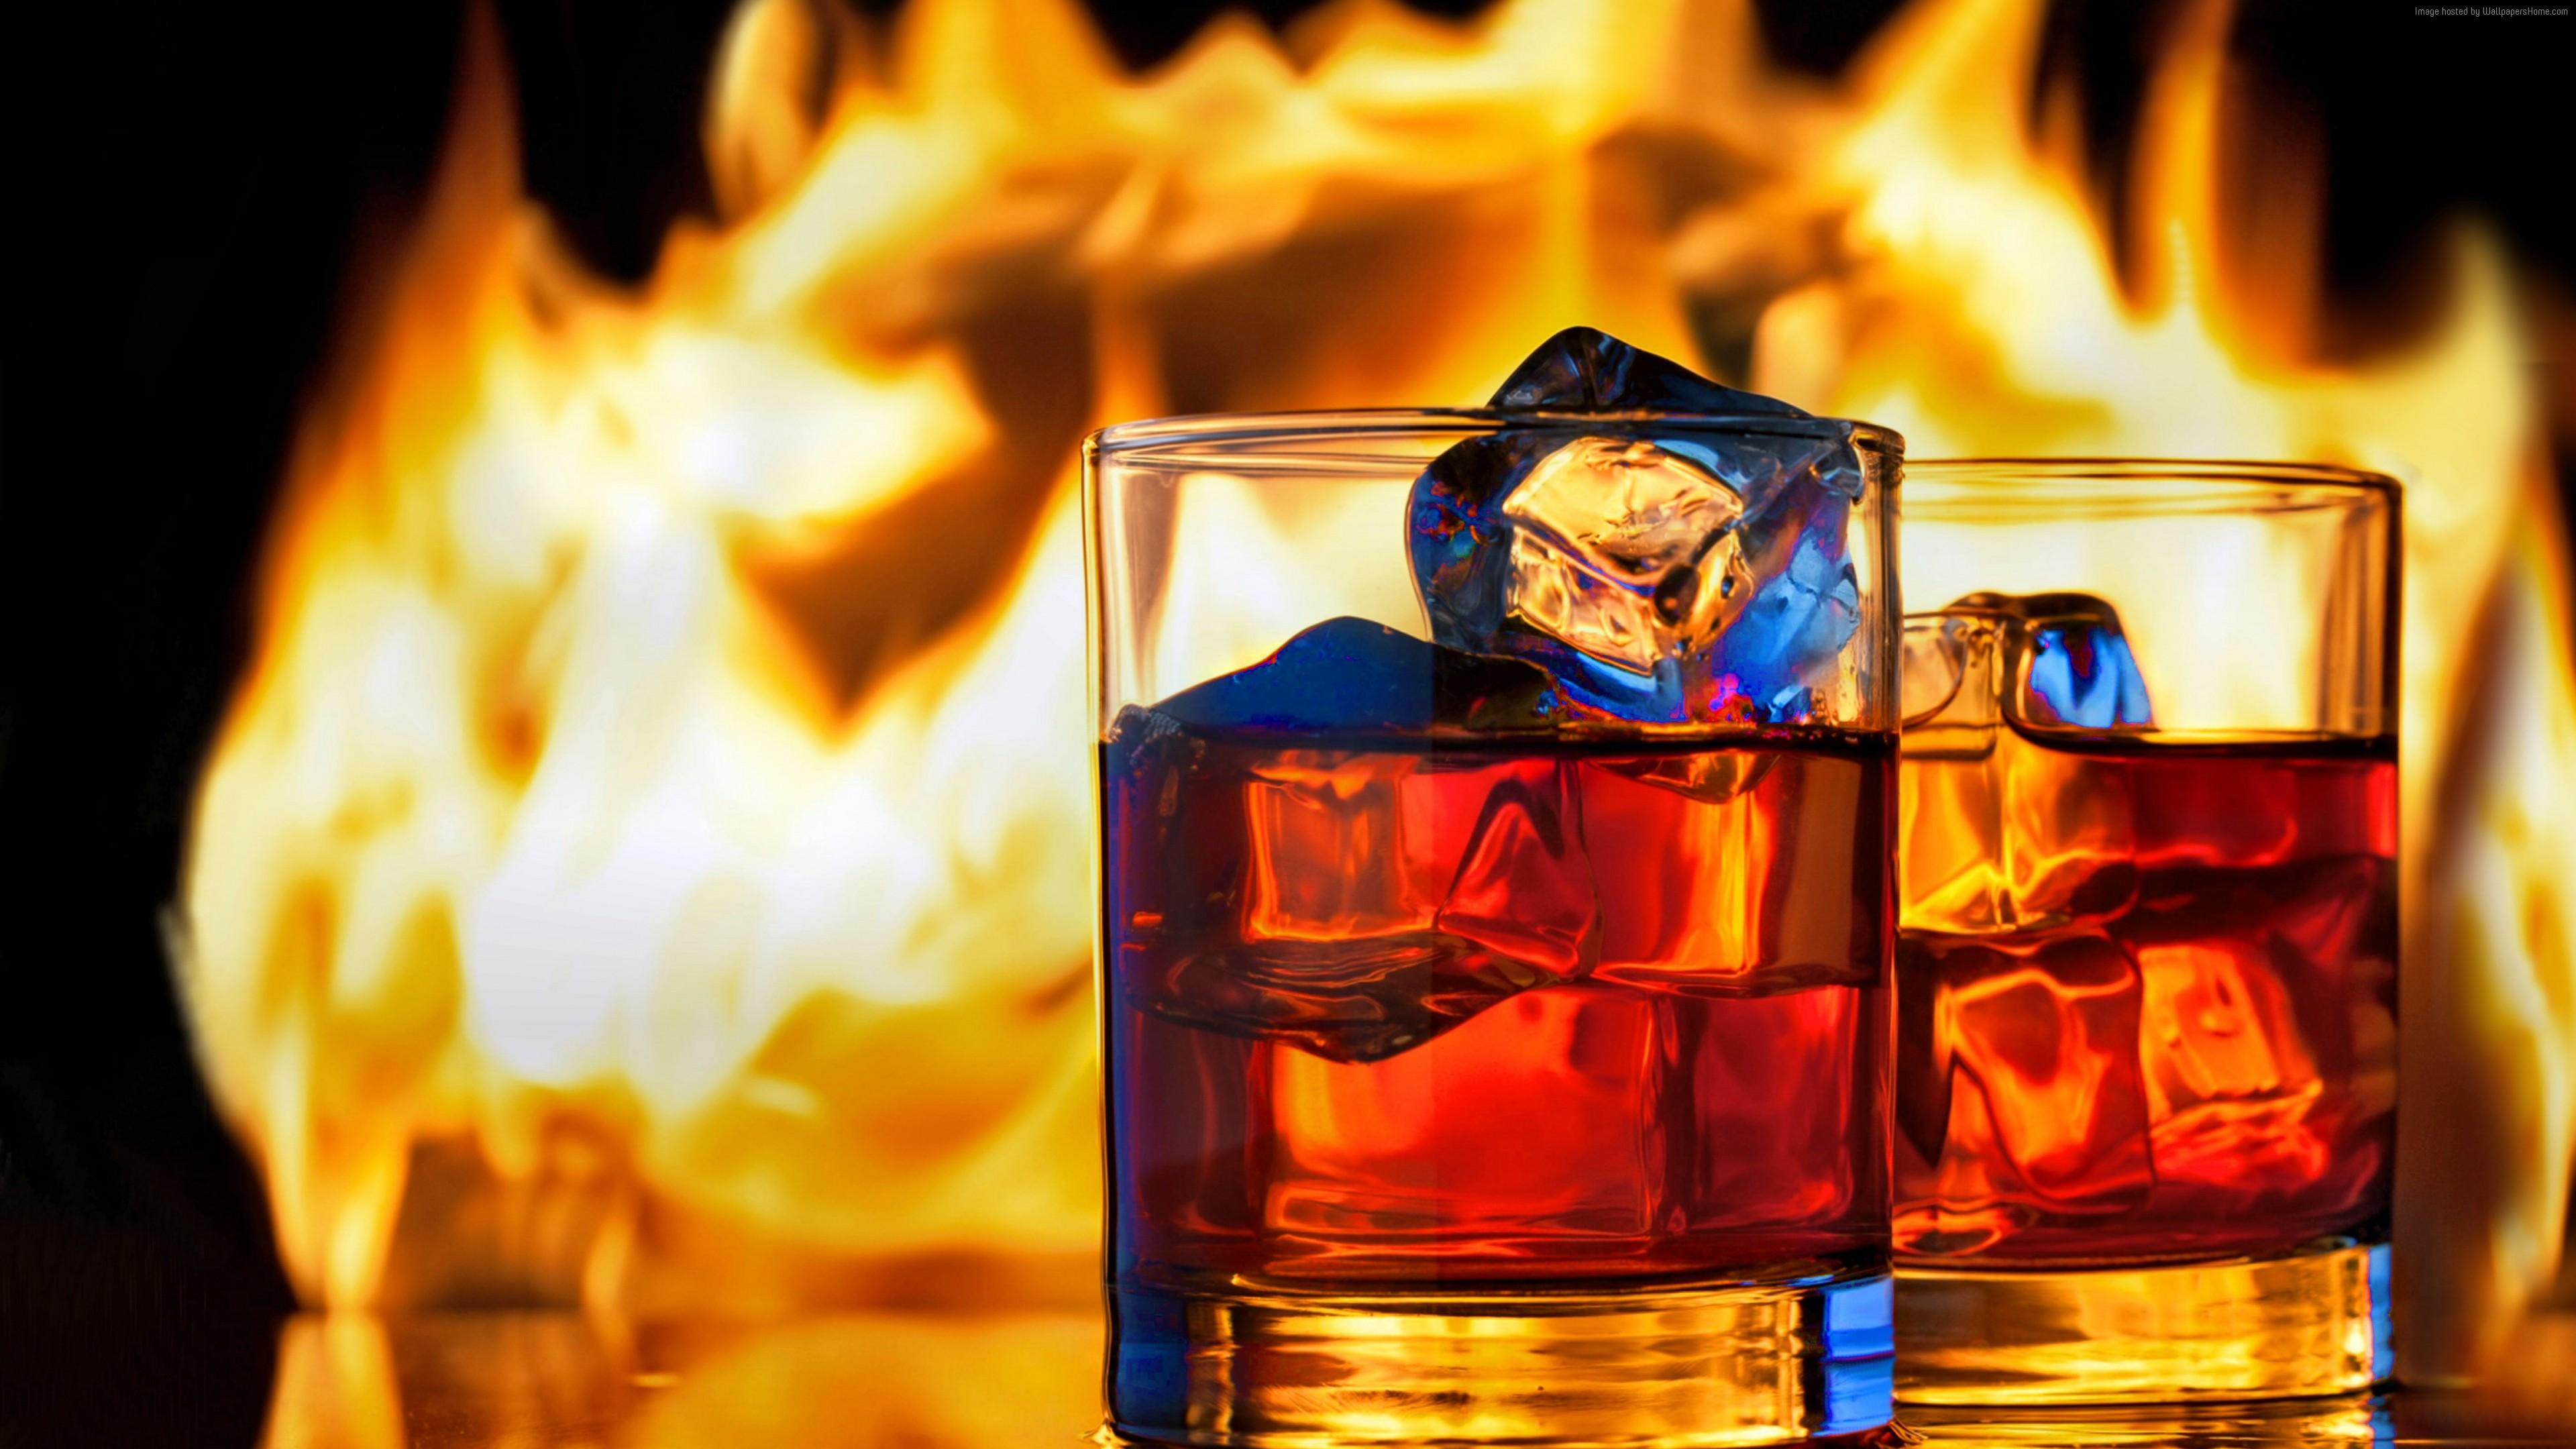 Wallpaper Whiskey Fire Ice 5k Food Wallpaper Download